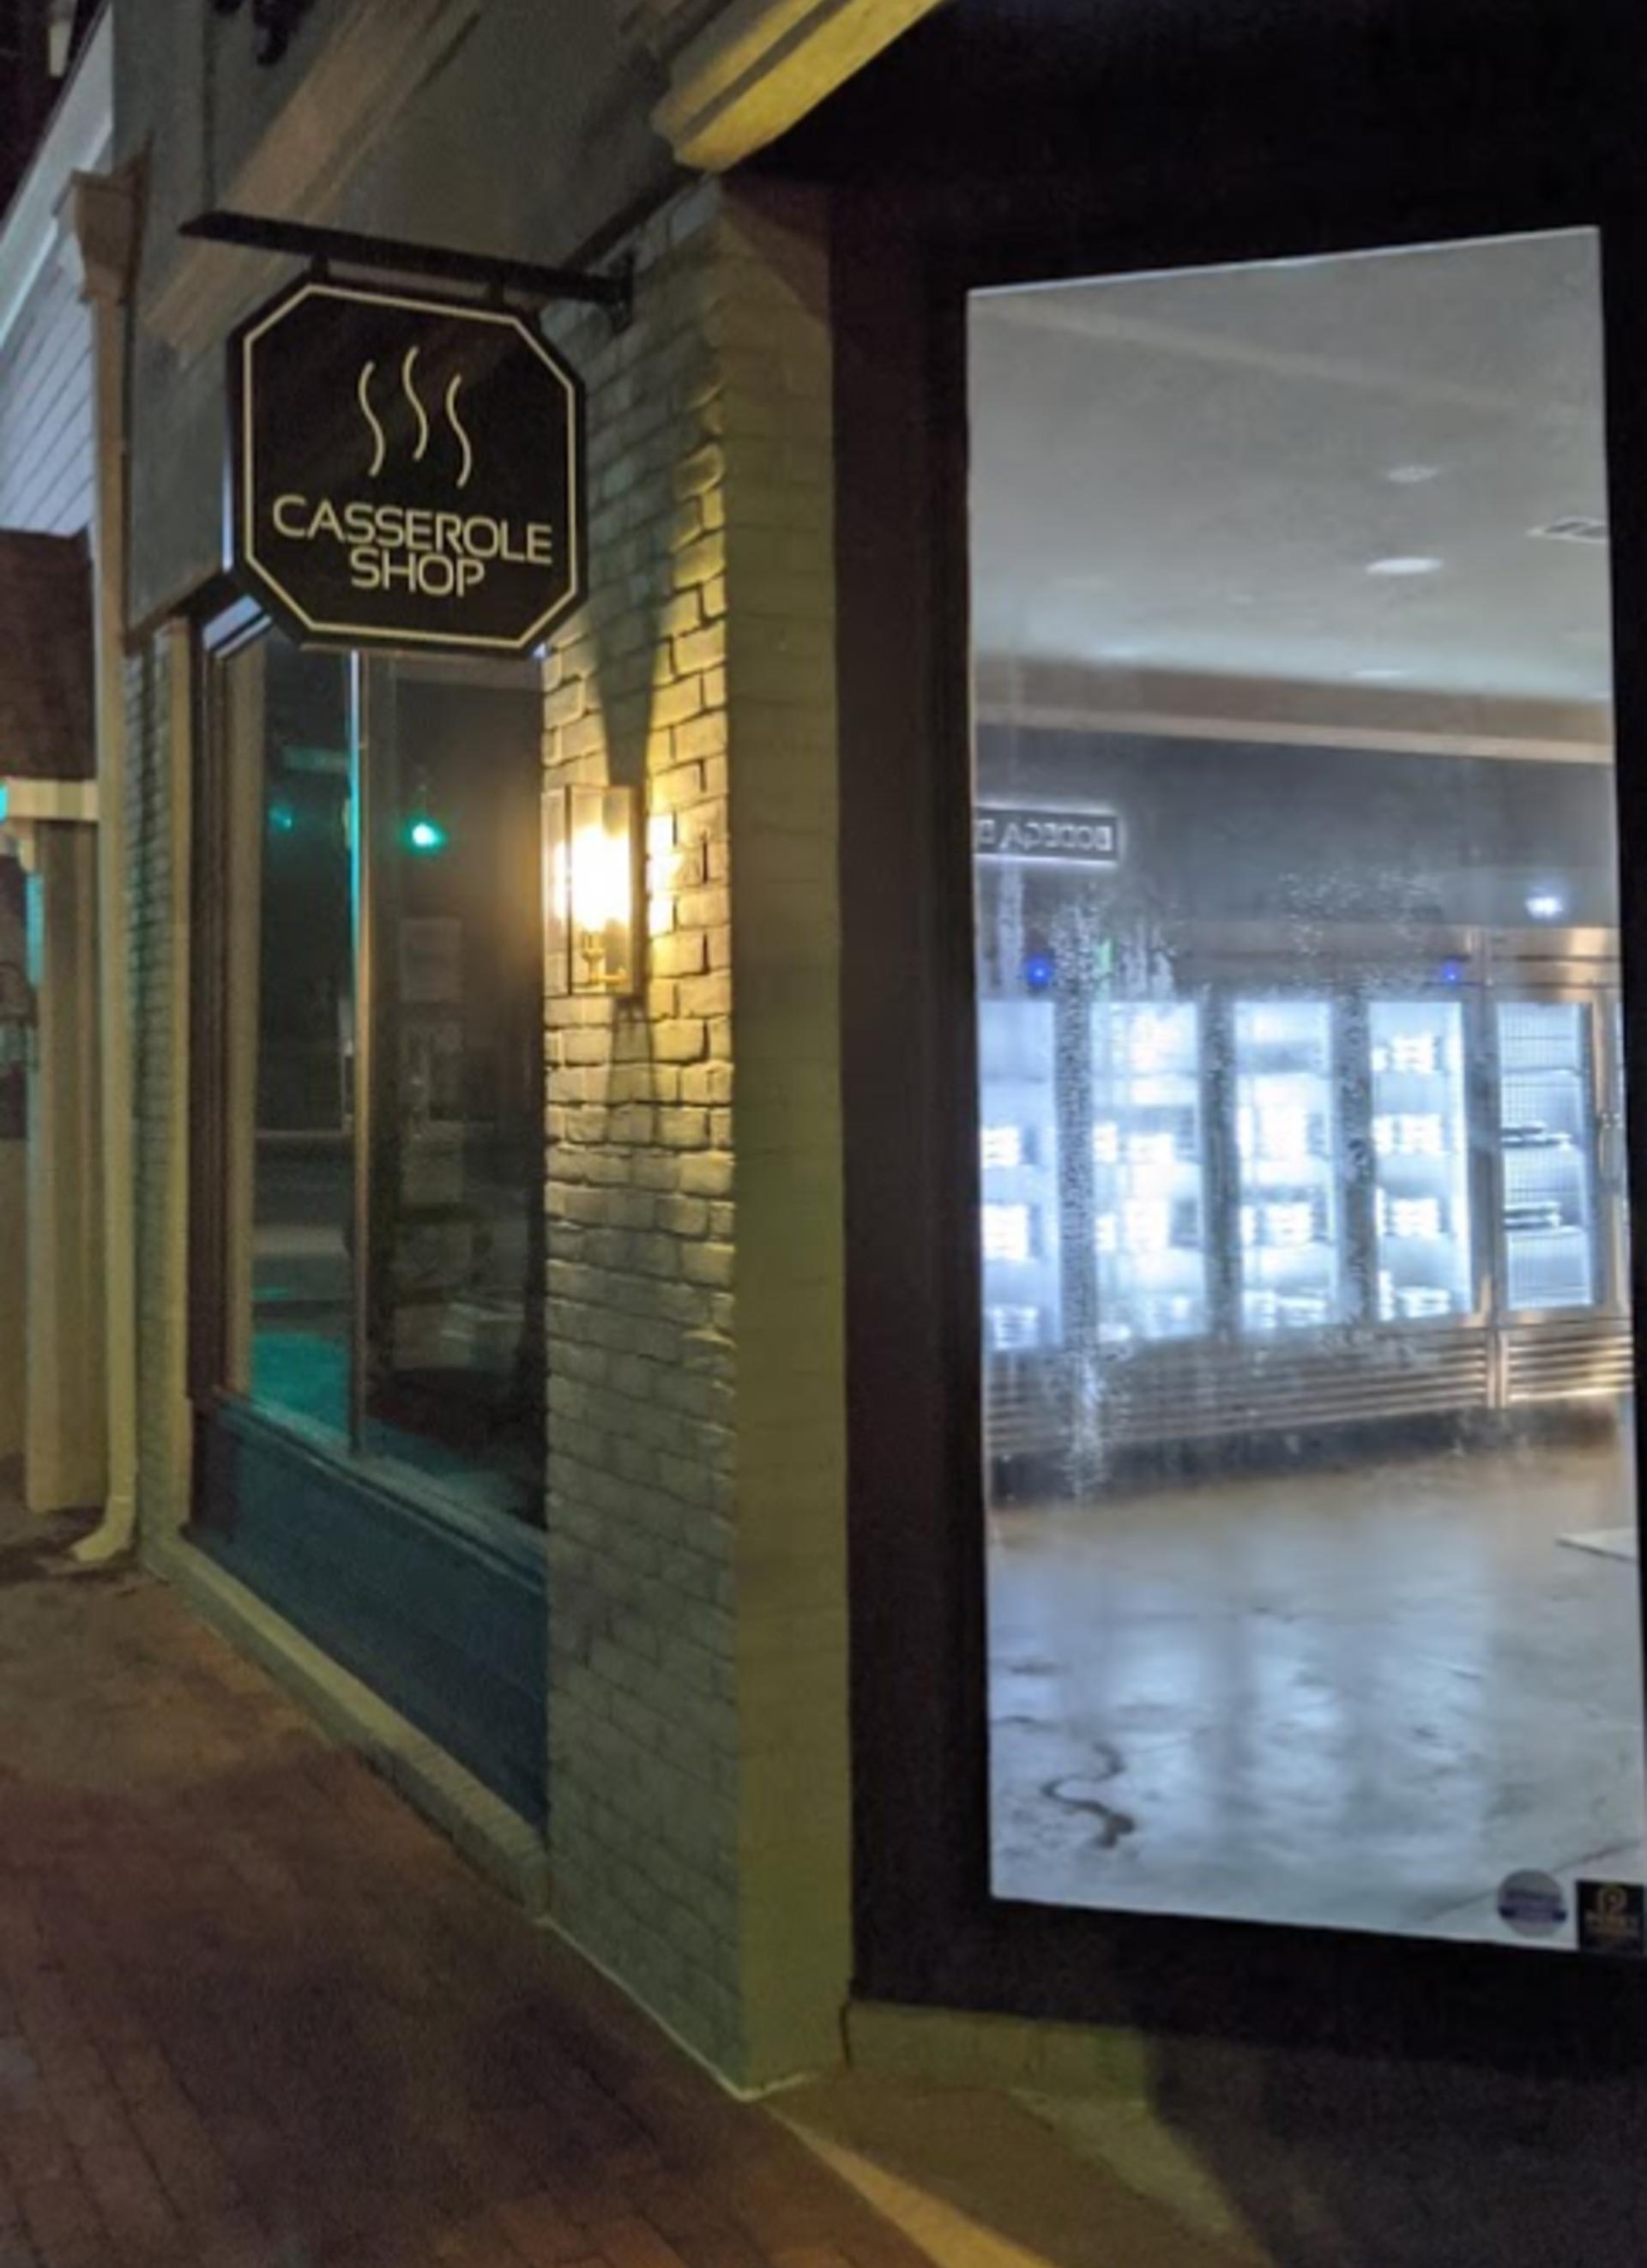 The Casserole Shop